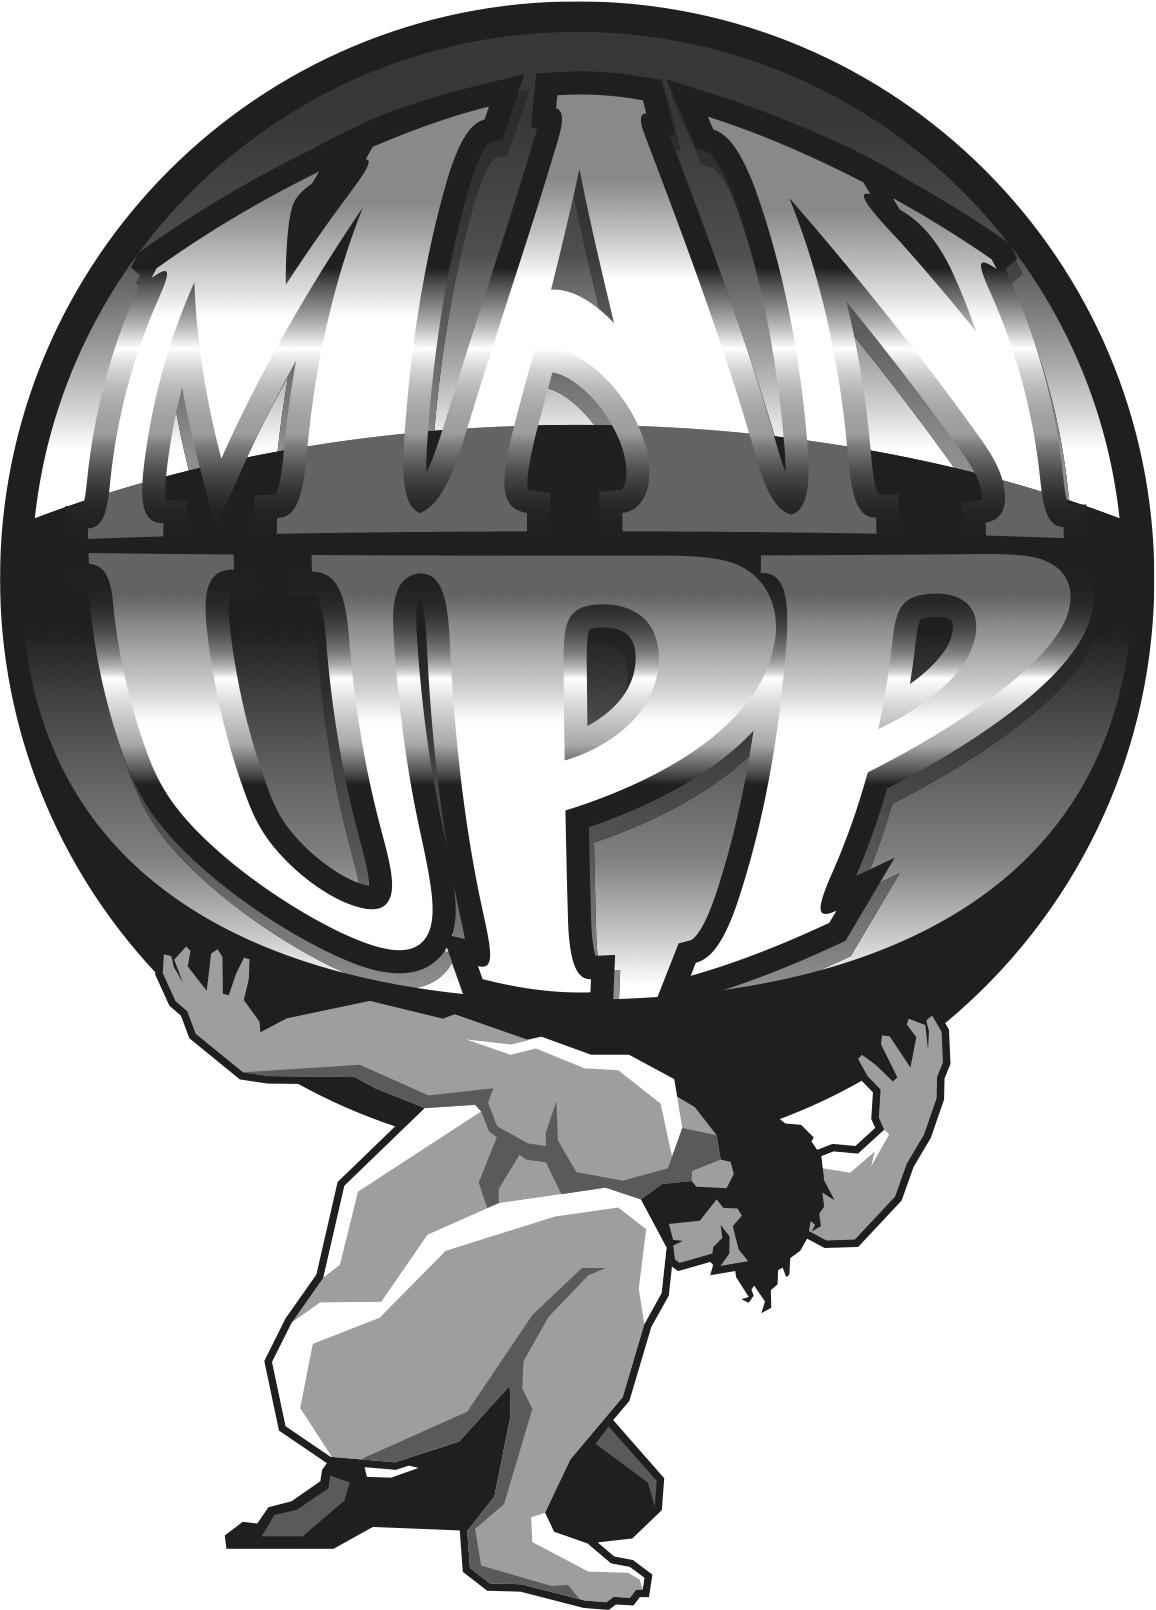 ManUpp Events